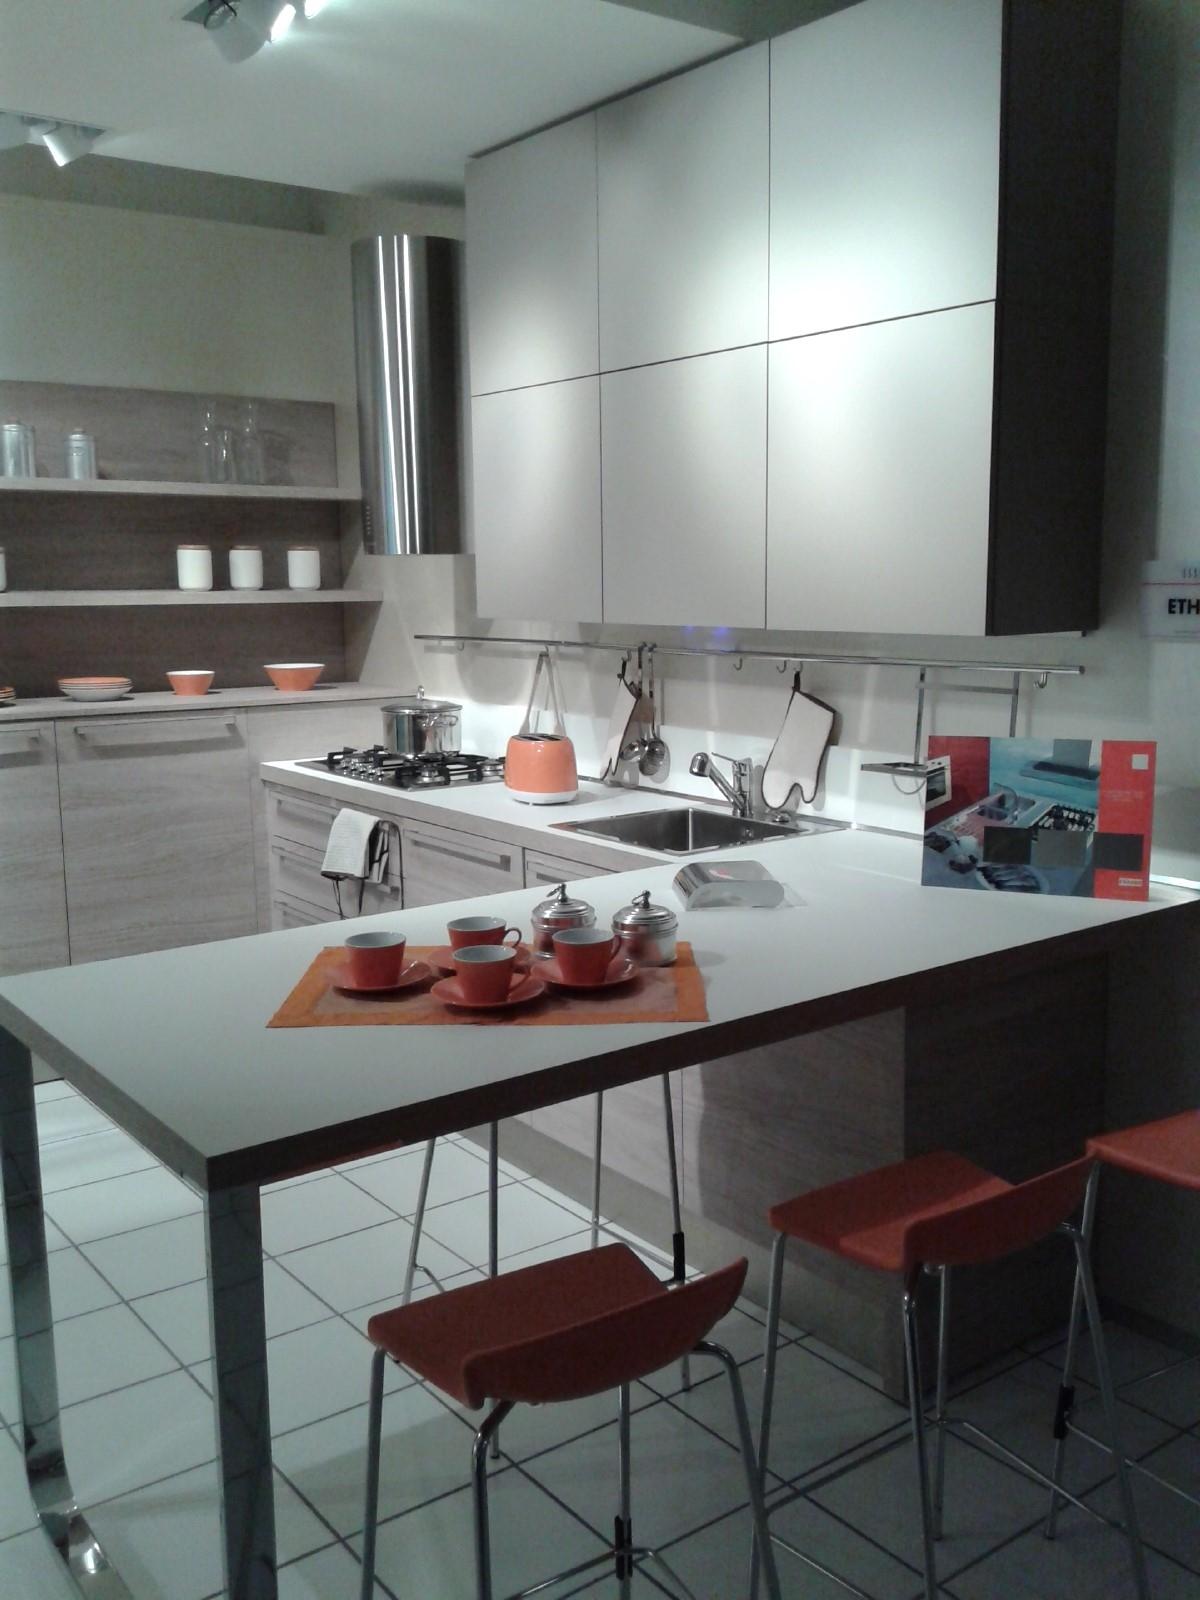 Cucina veneta cucine ethica decorativo laminato materico cucine a prezzi scontati - Cucina veneta cucine ...